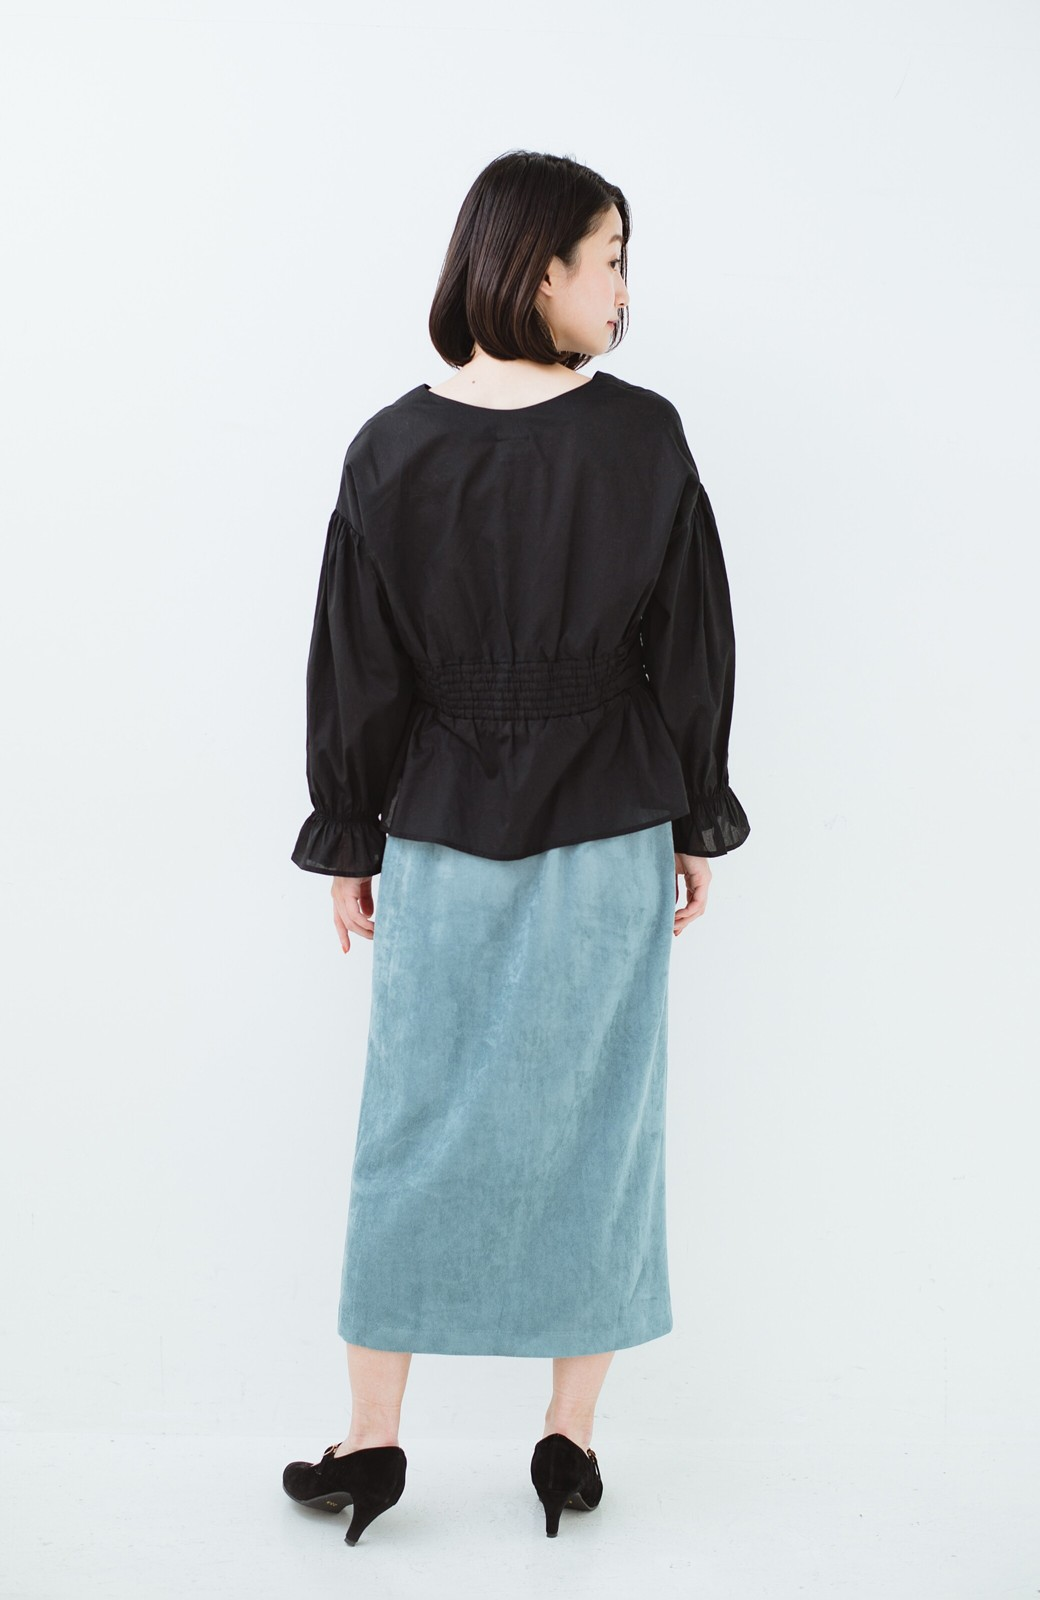 haco! 大人が安心して着られるタイトスカート by que made me <グレイッシュブルー>の商品写真17